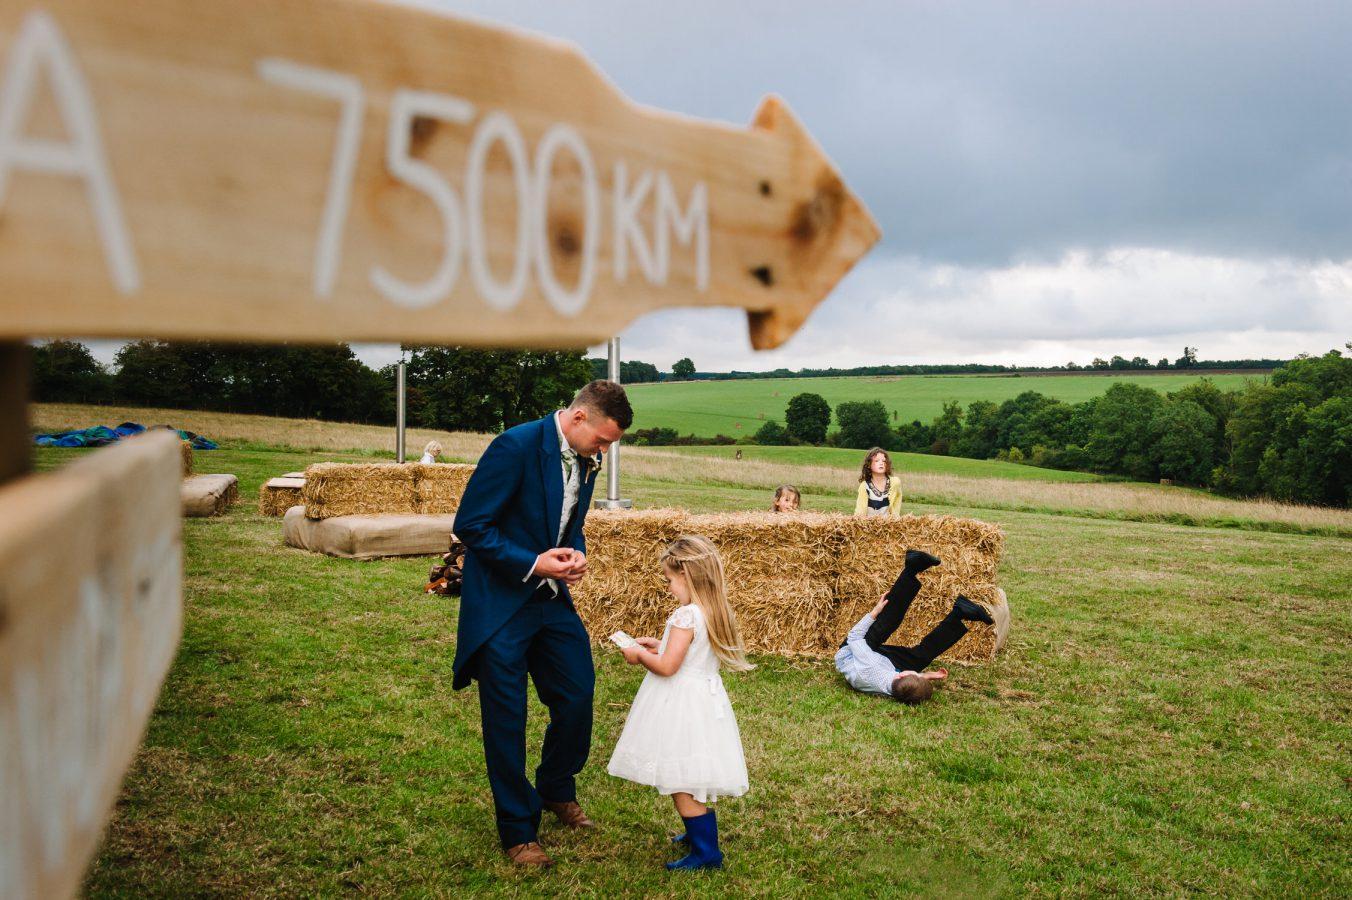 children playing at farm wedding Karen Flower Photography